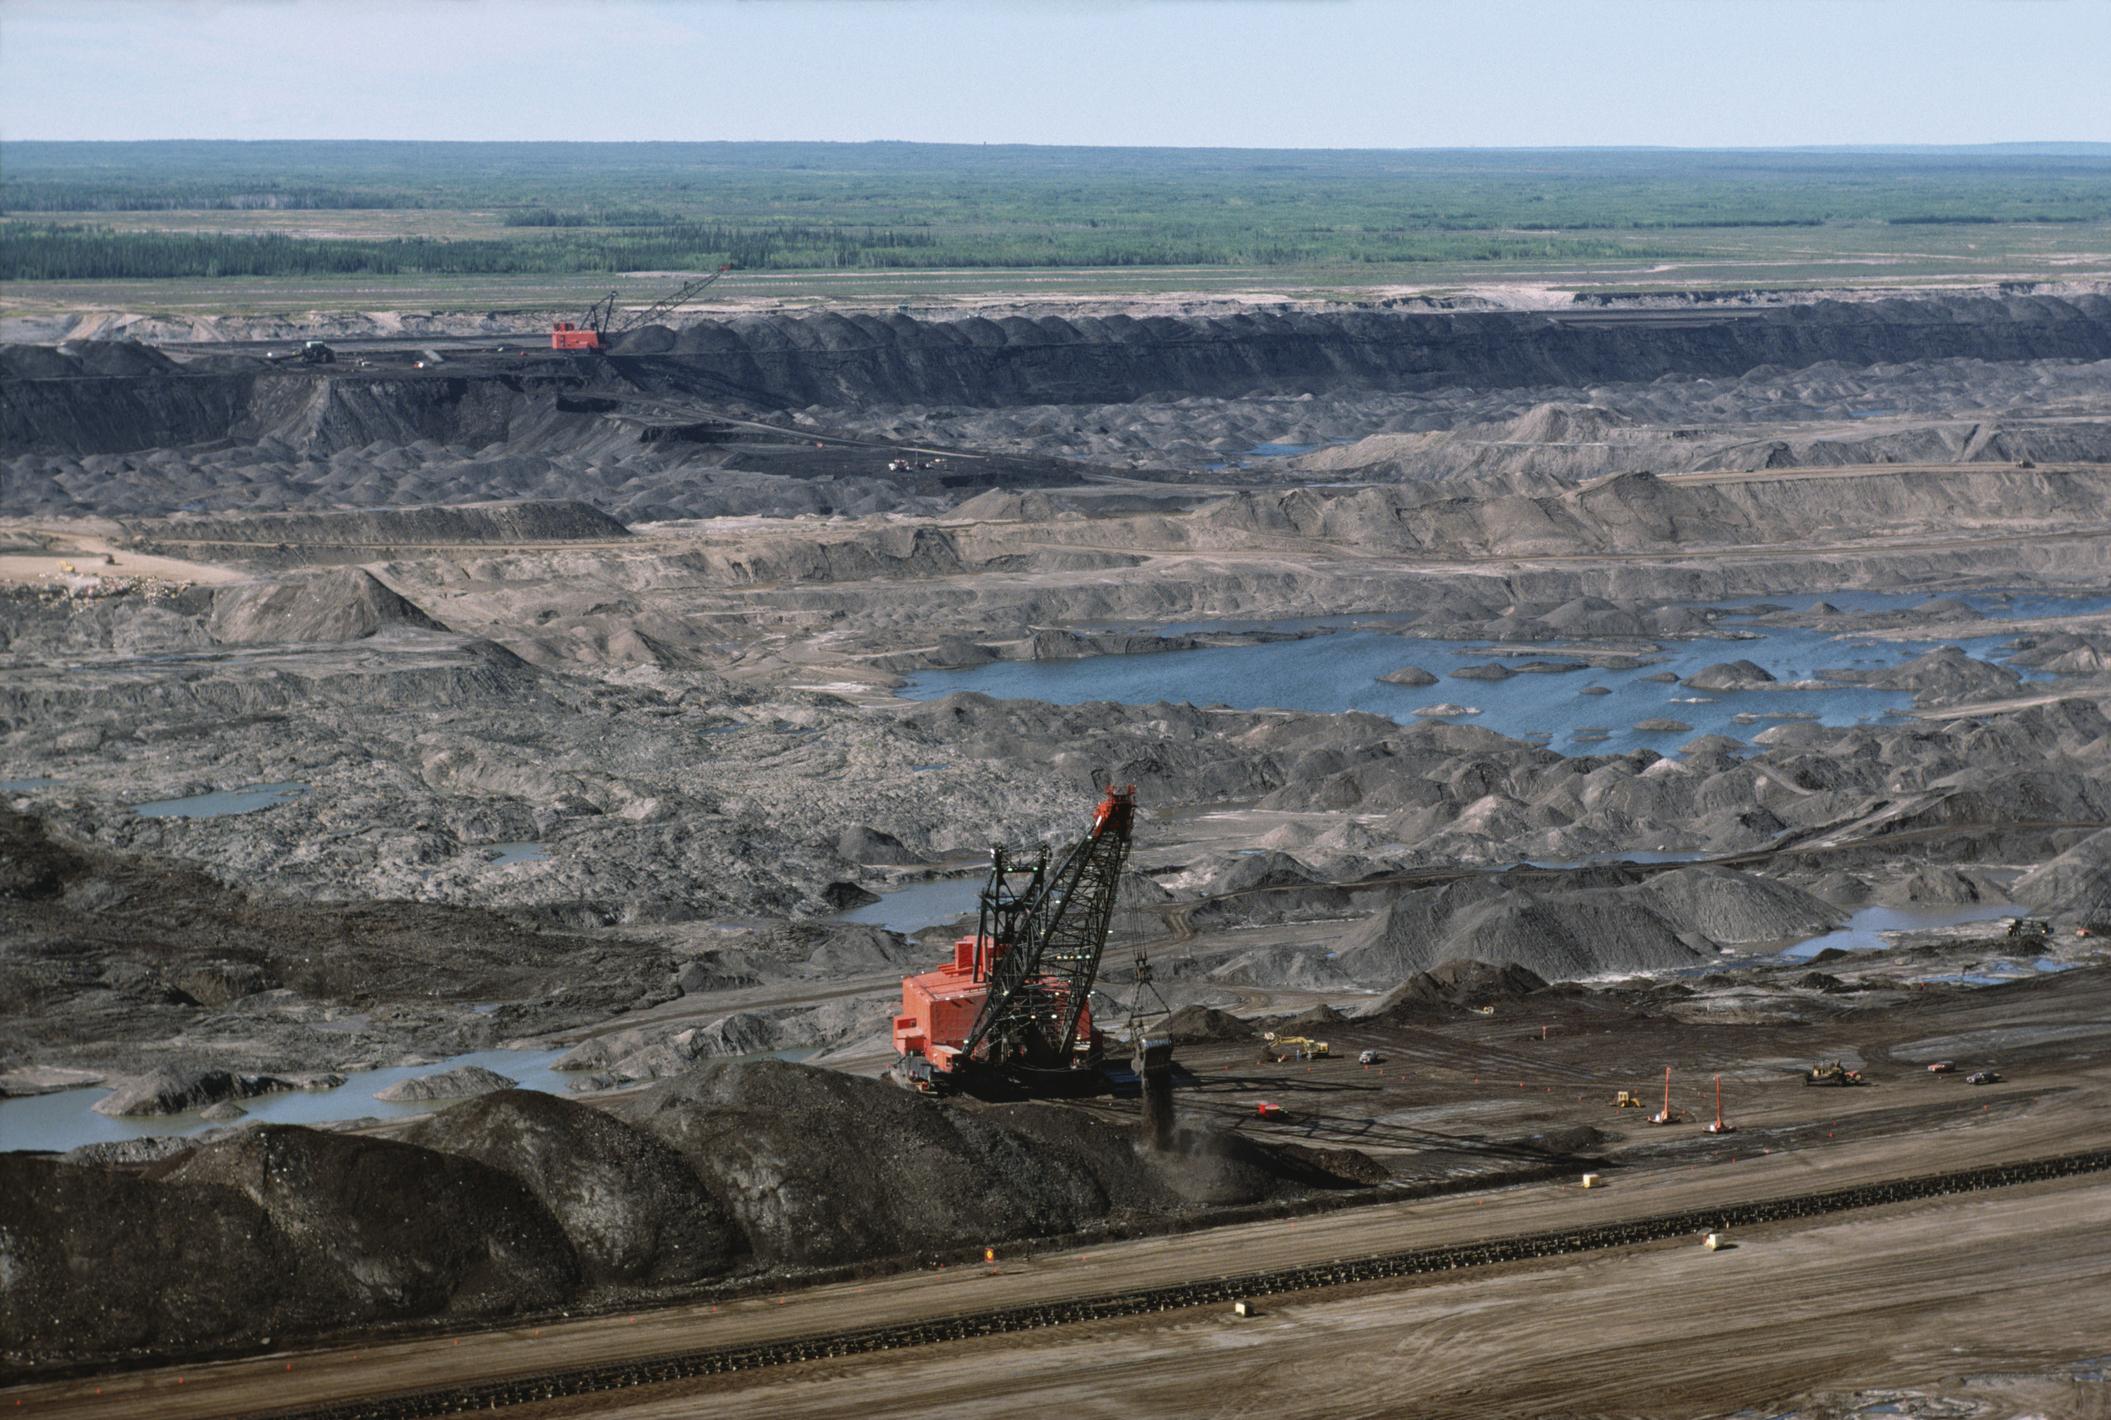 An oil sand mining field.